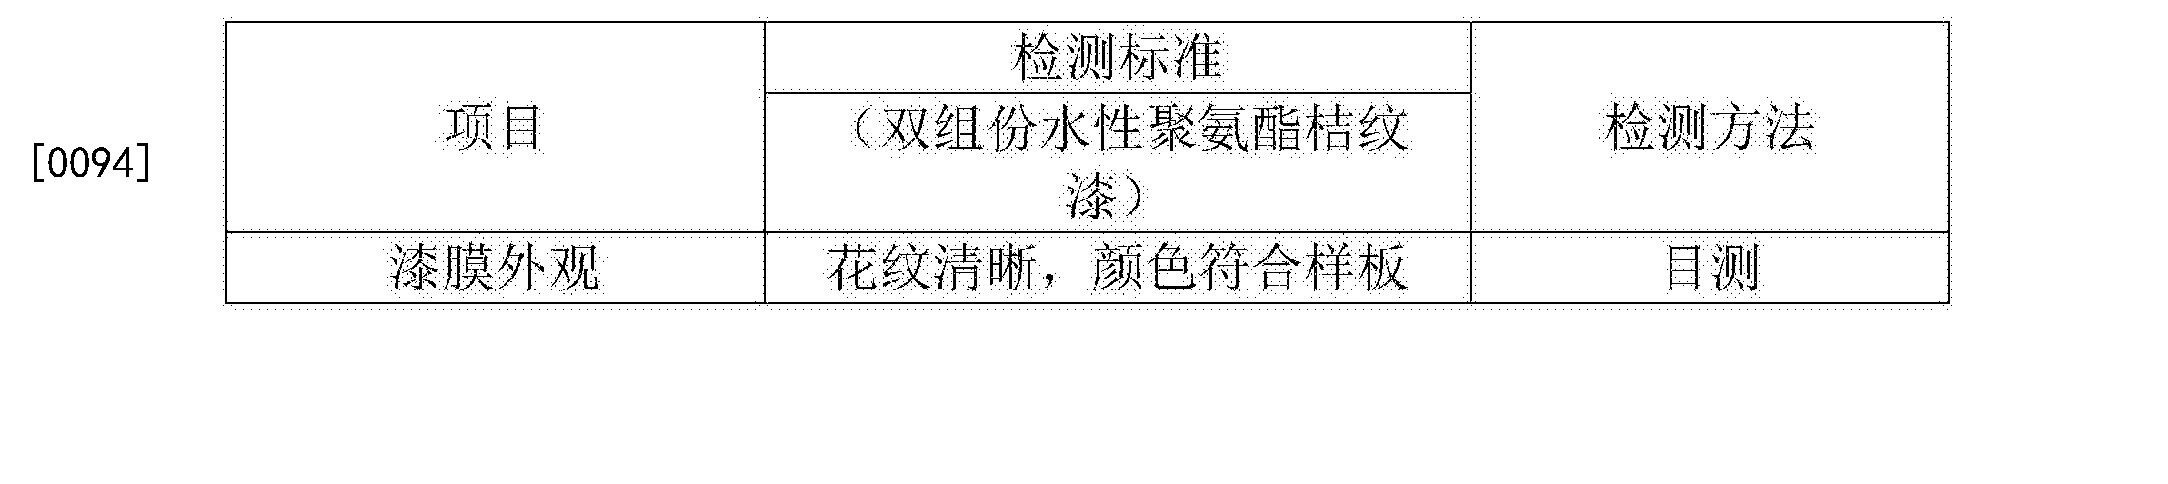 Figure CN107365549AD00102